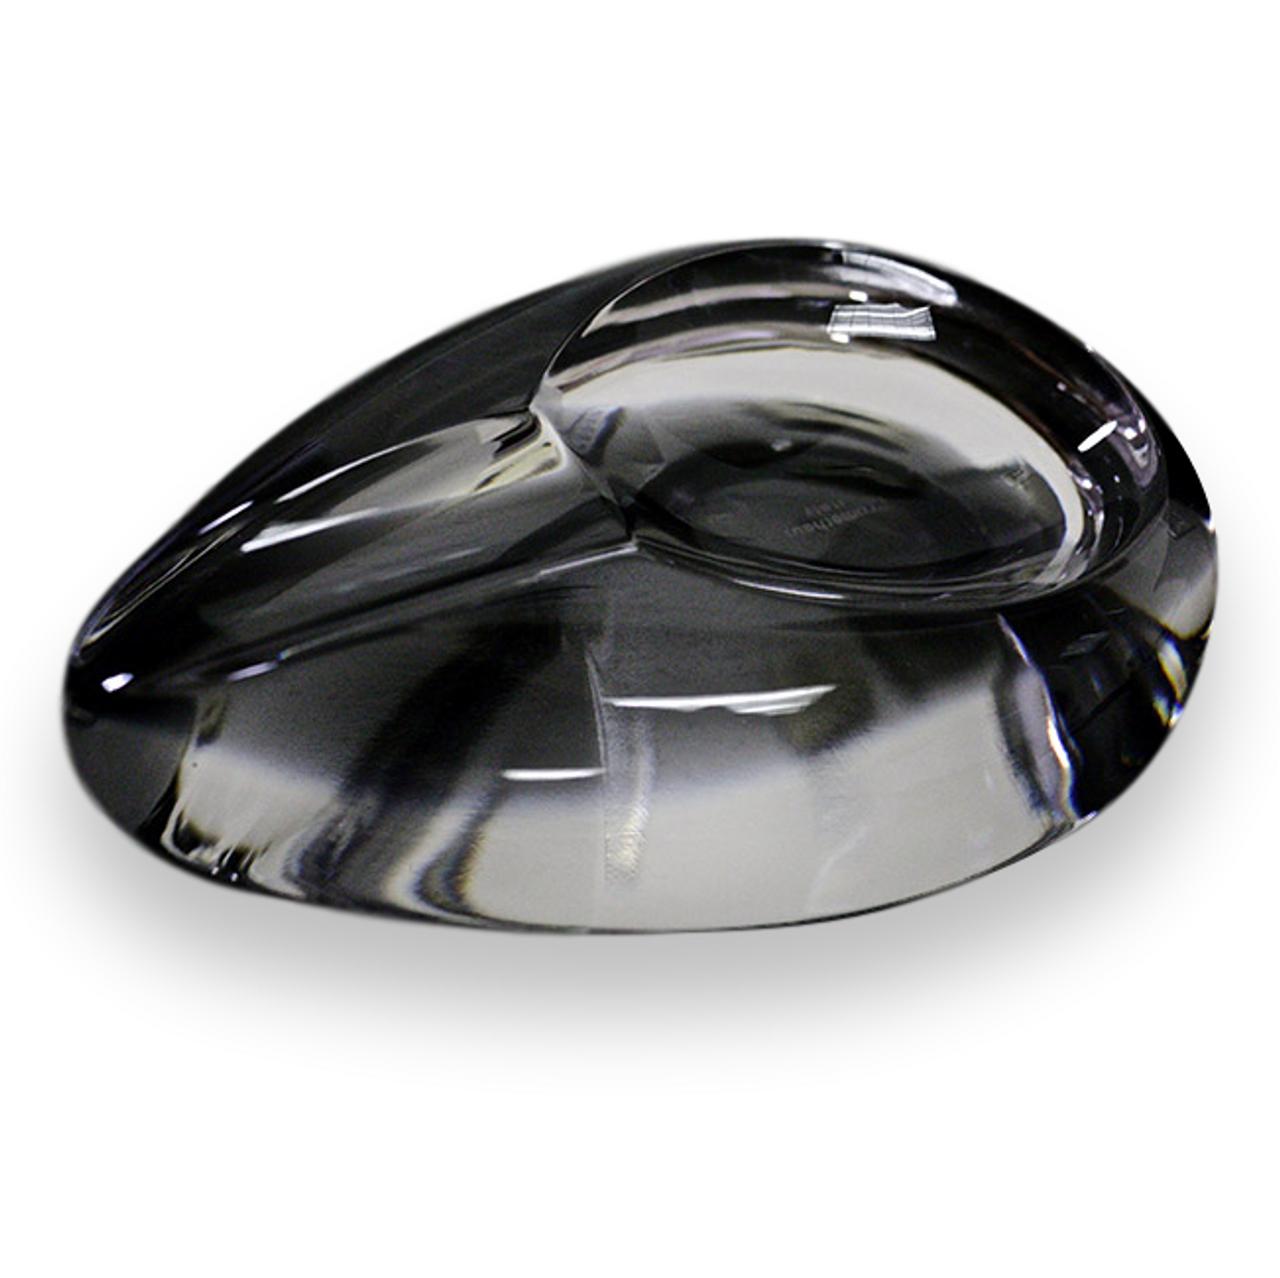 Metallo Posacenere Humidor Umidificatore